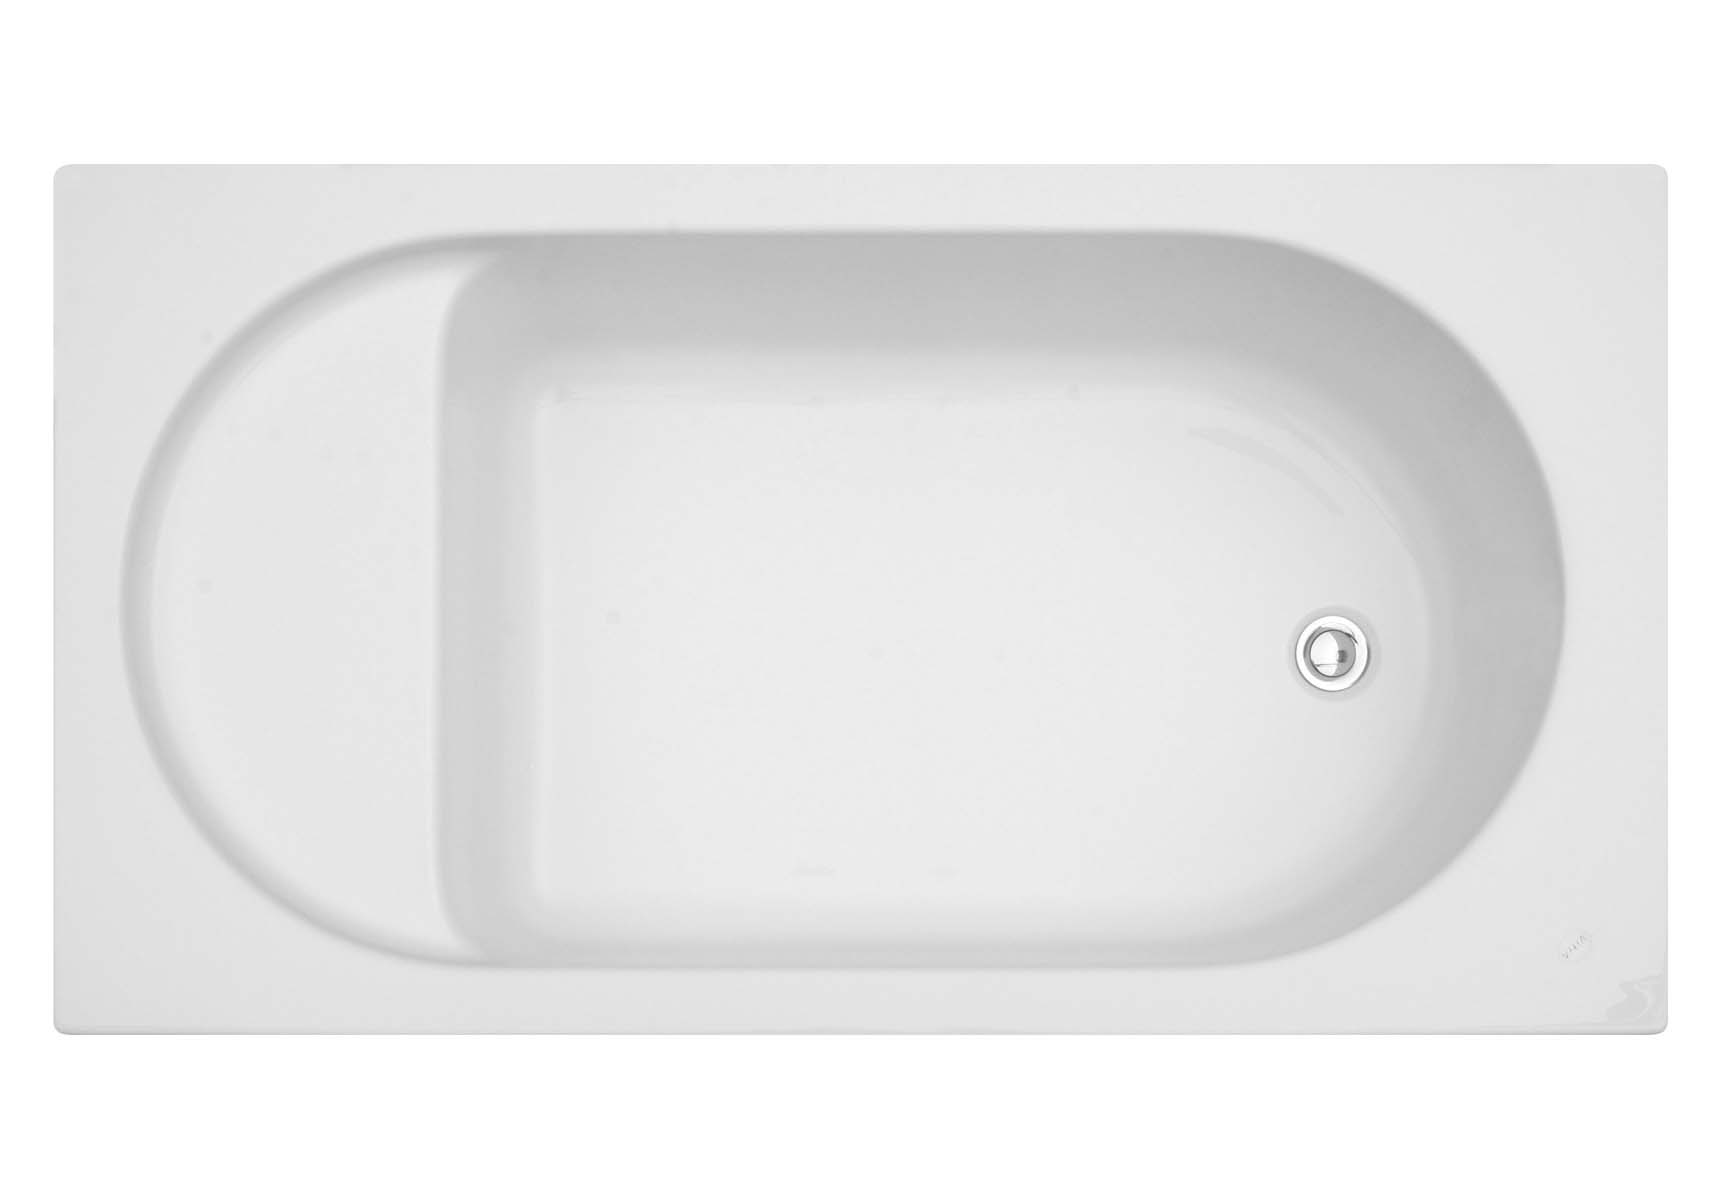 Optima 120x70 cm Rectangular with Seat Bathtub